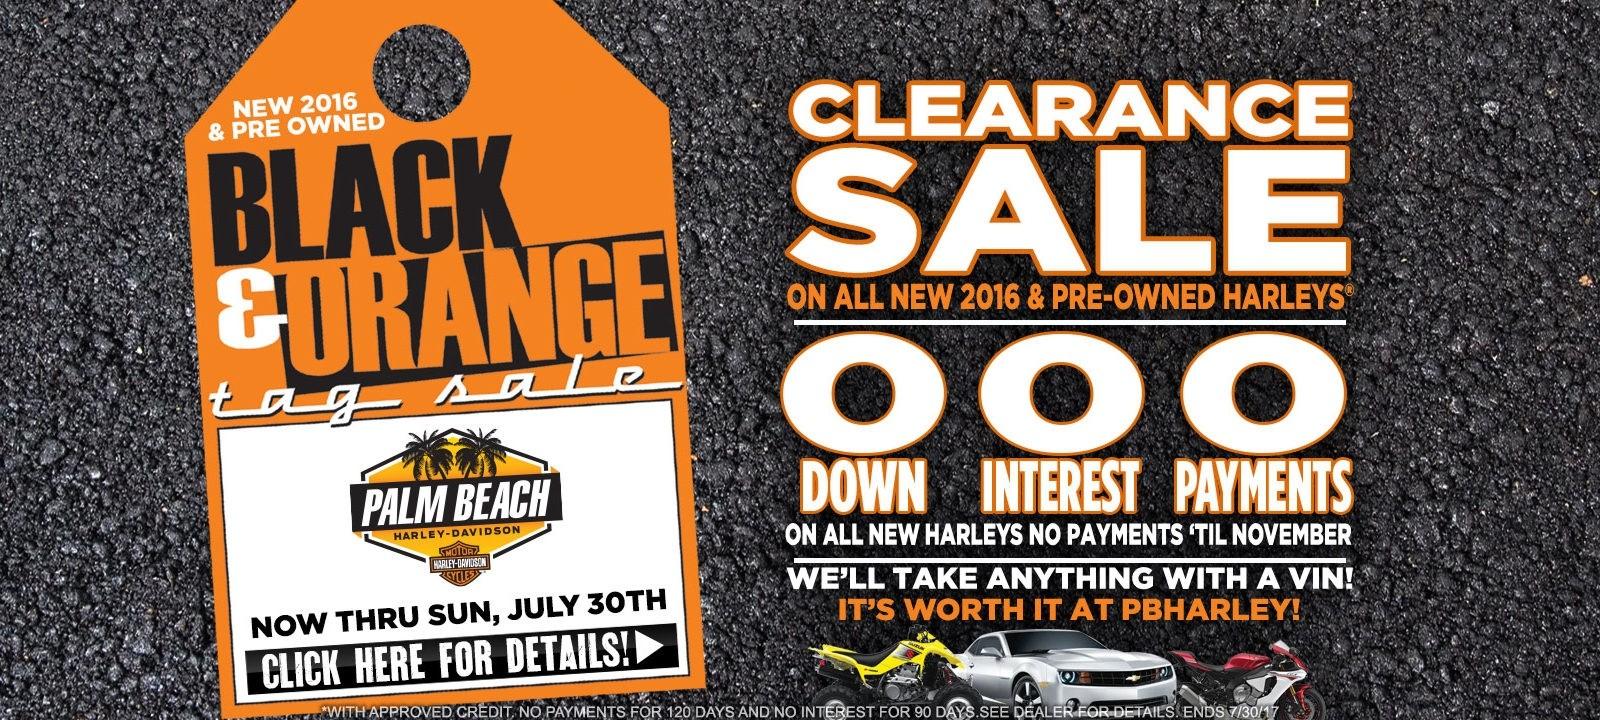 20170724-PBHD-1800x720-Black-&-Orange-Tag-Sale-1